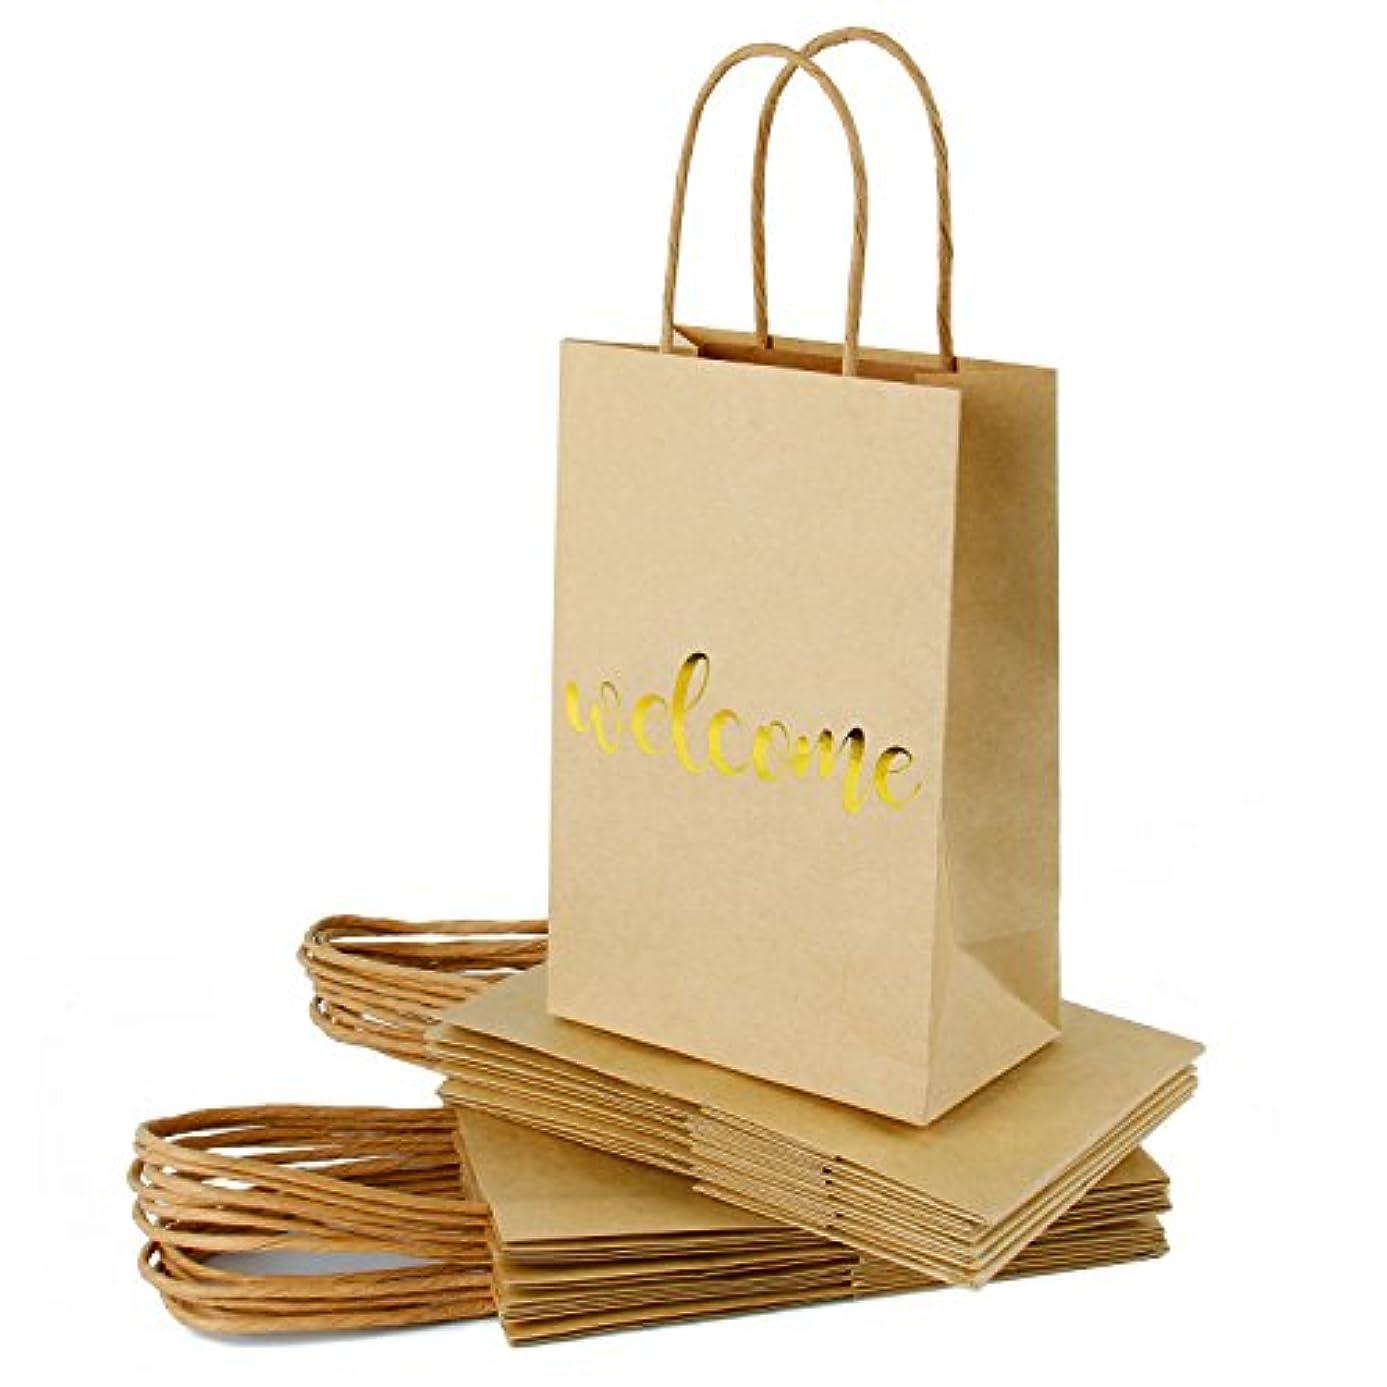 RUSPEPA Welcome Kraft Gift Bags -Gold Foil Kraft Paper Gift Bag Set Wedding,Birthday Present-12Pack -5-1/2